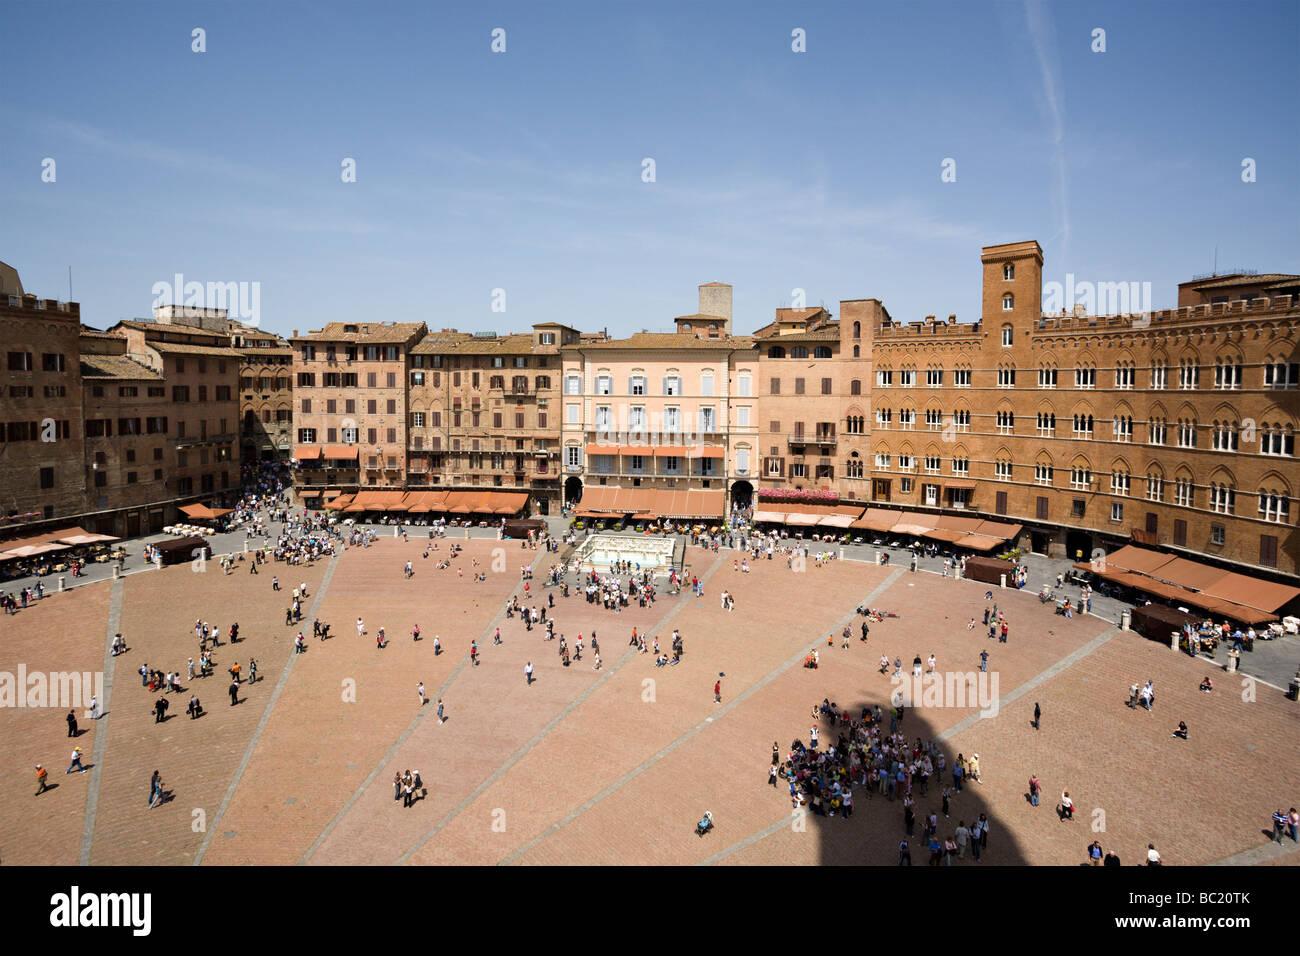 Piazza del Campo at Siena - Stock Image